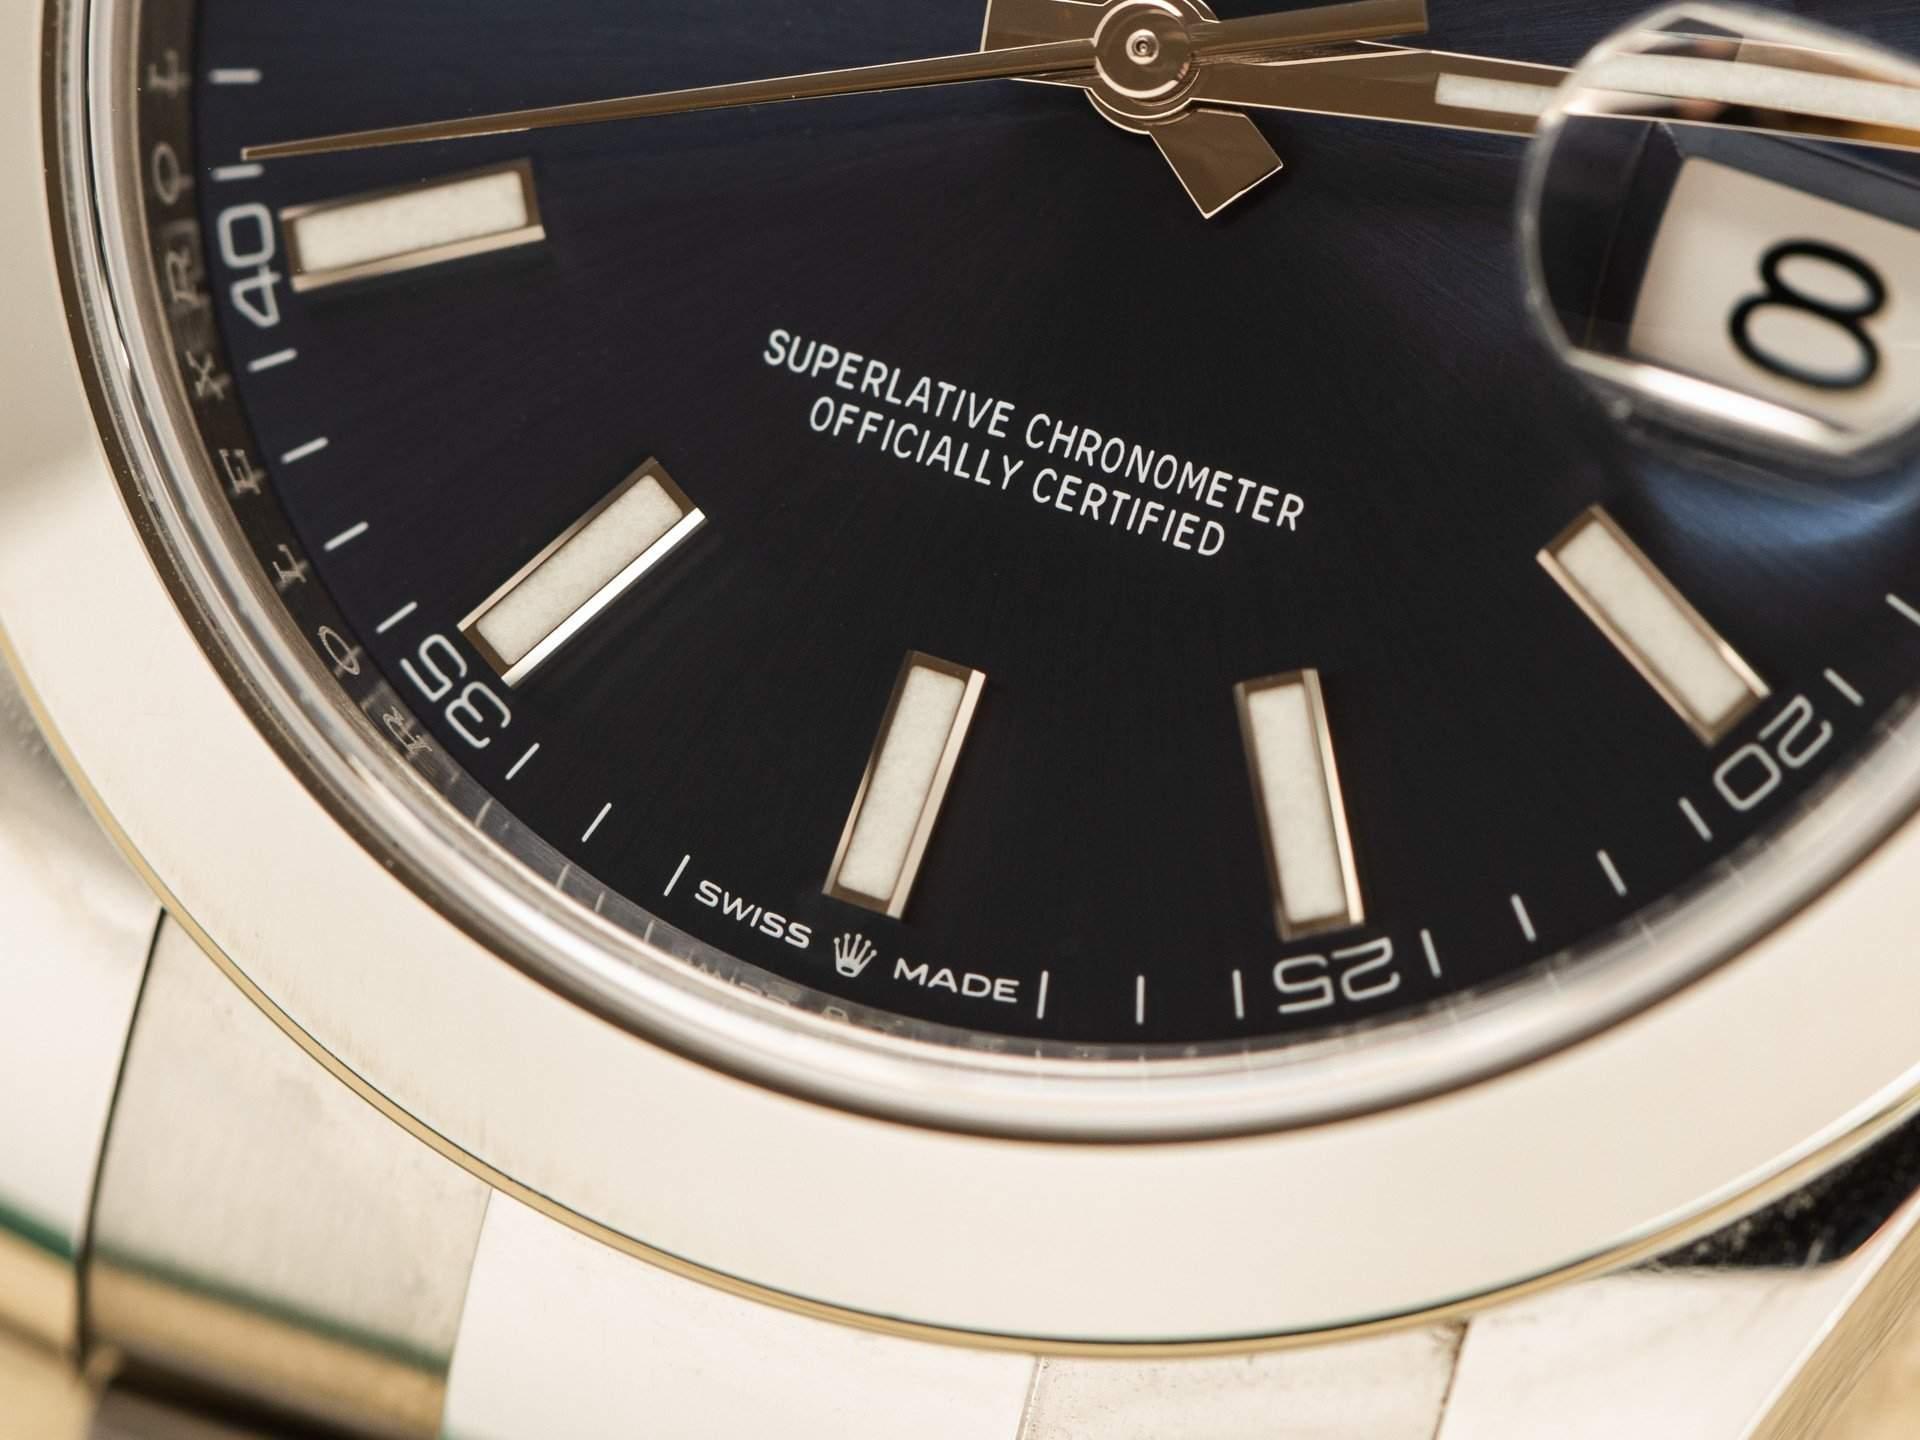 Superlative Chronometer Officially Certified inscription